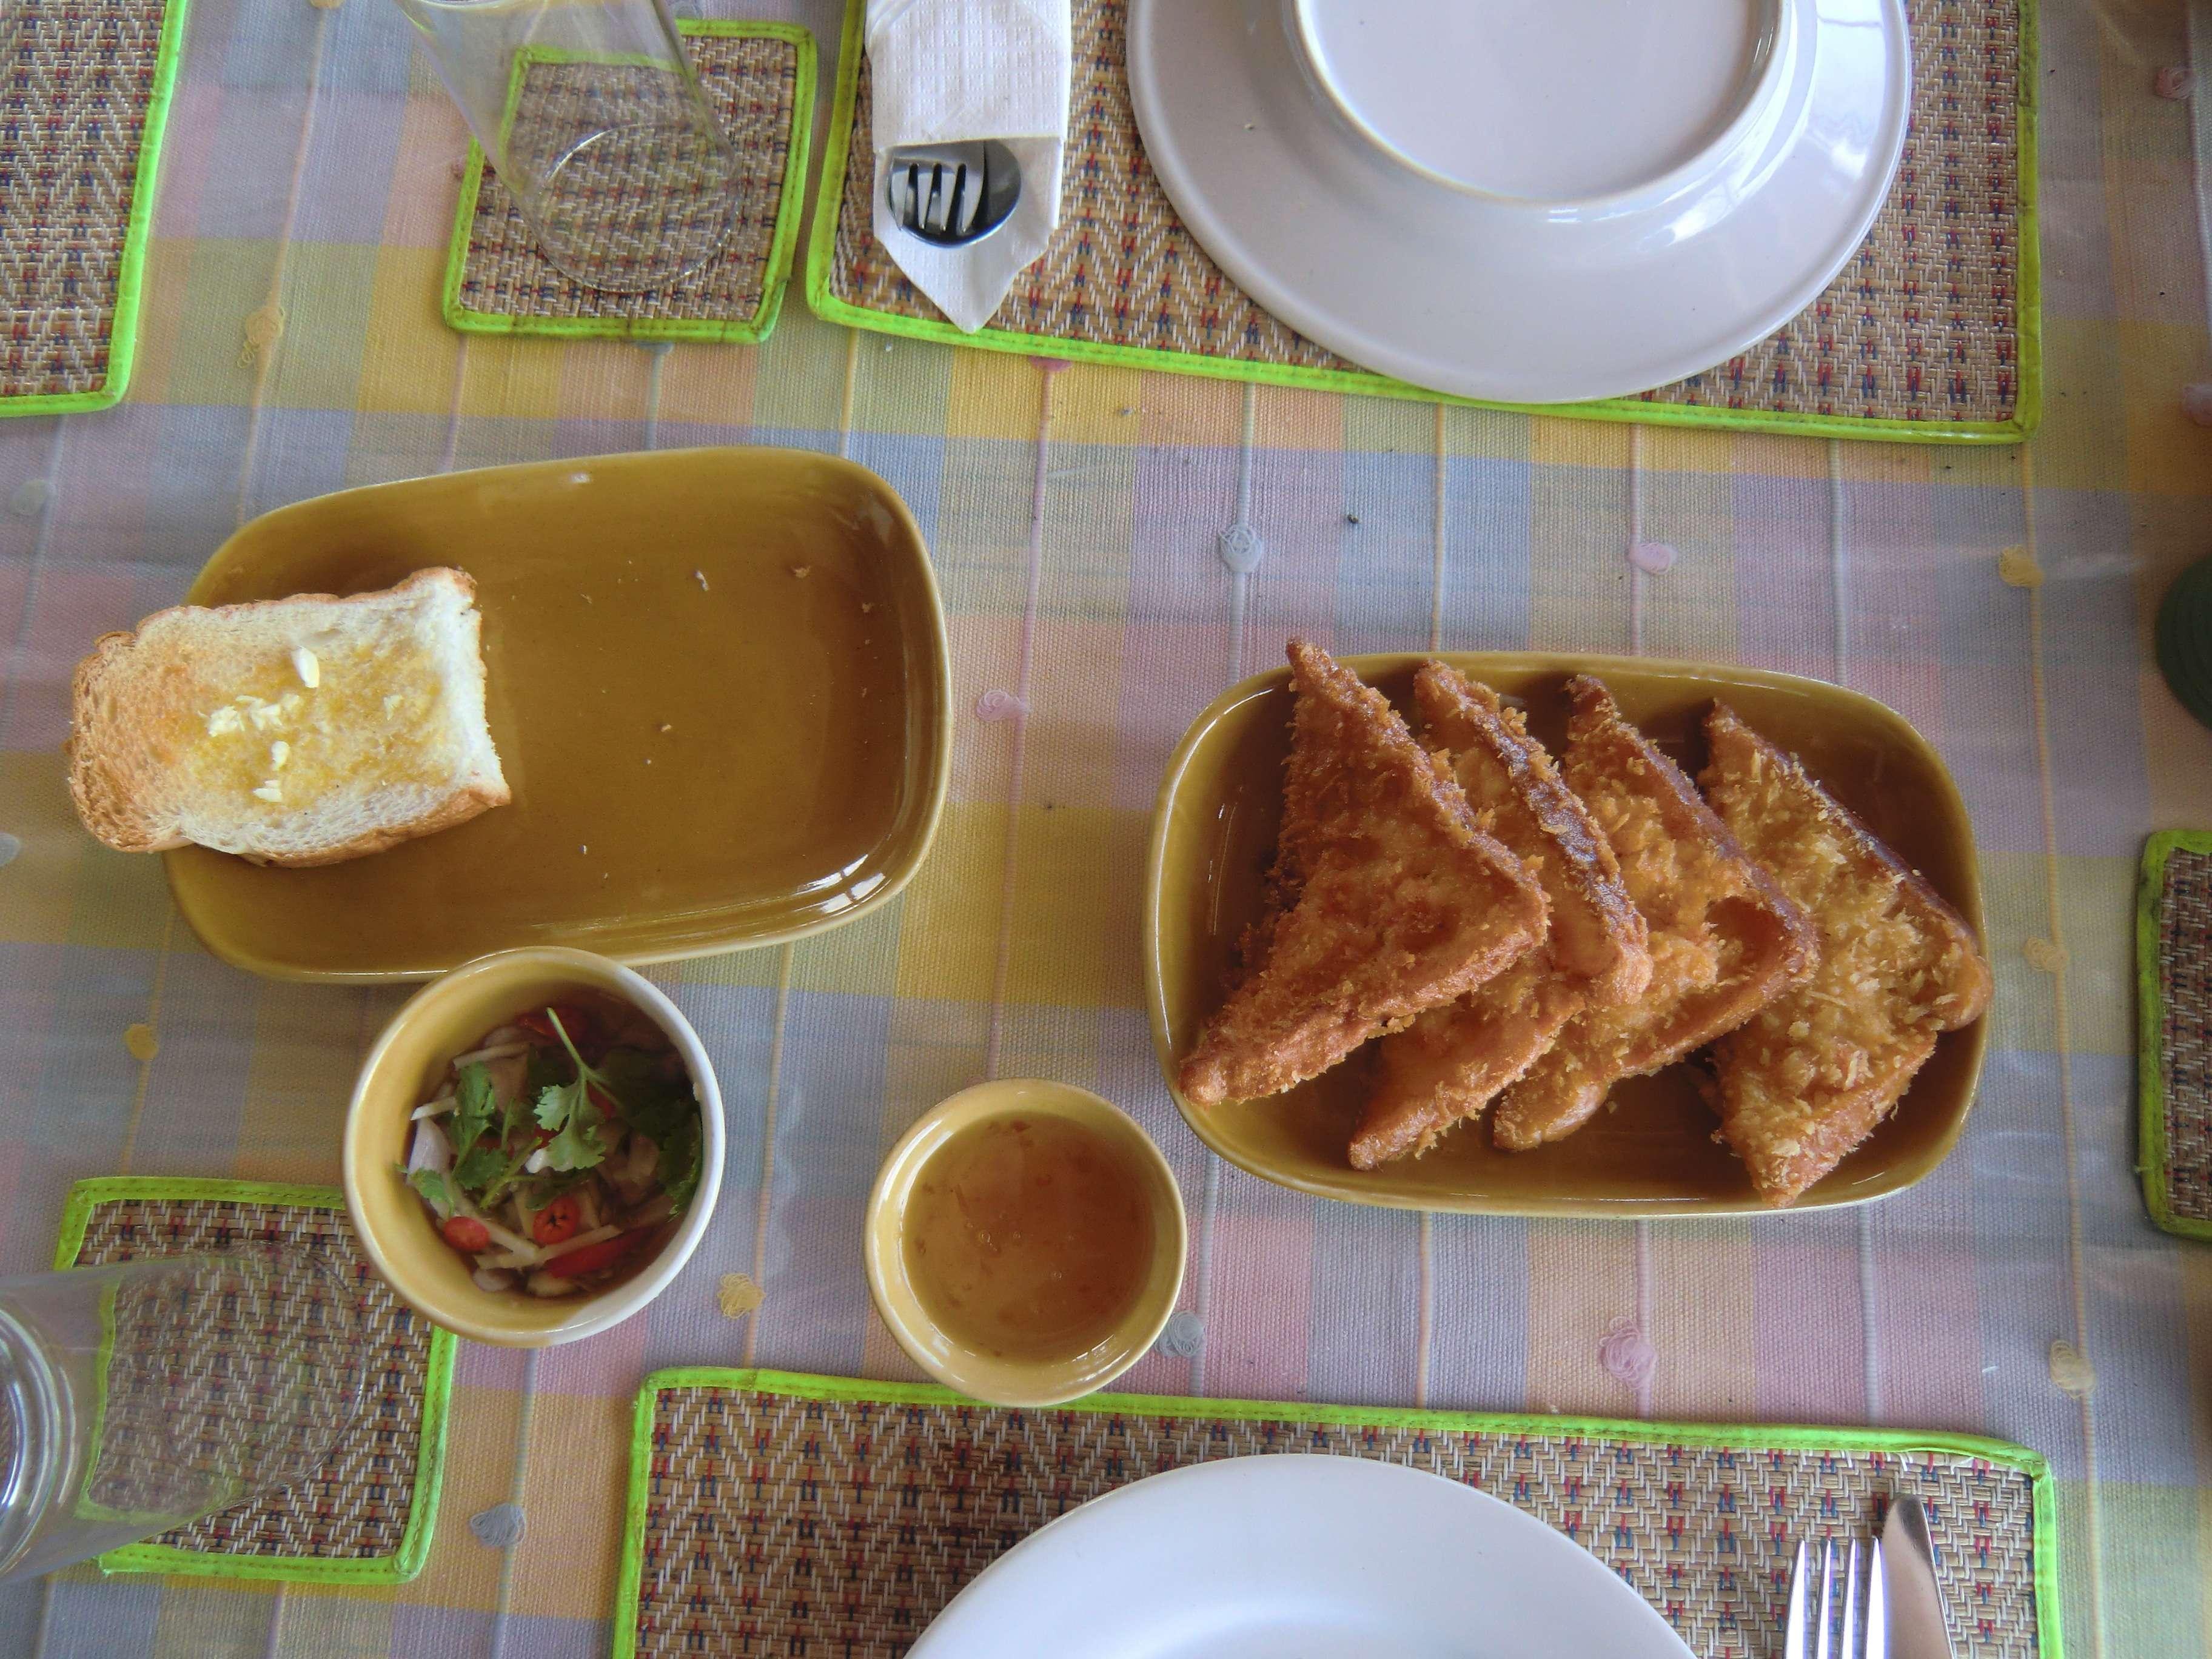 links: Knoblauchbrot, rechts: überbackenes Toast mit Shrimps & Kräutern